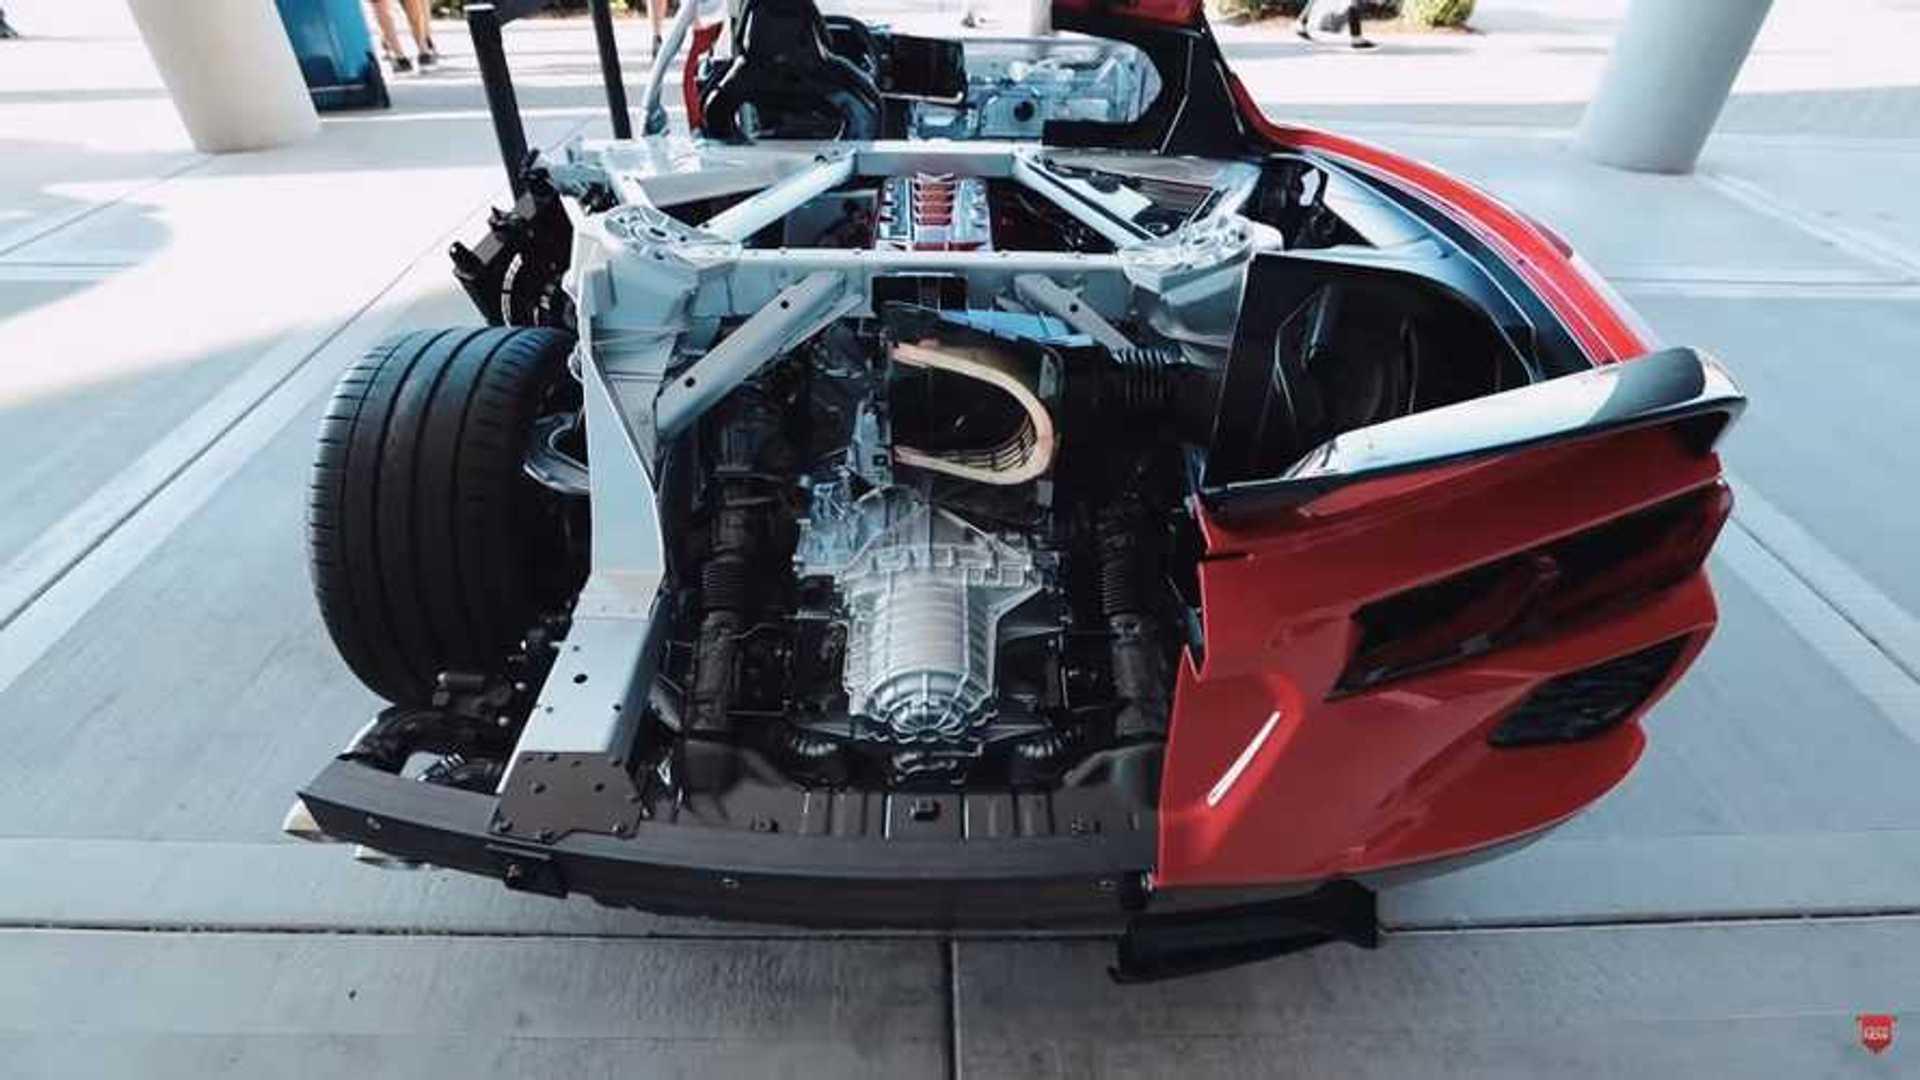 2020 Chevy Corvette Cutaway Walkaround Is A Gearhead Dream ...